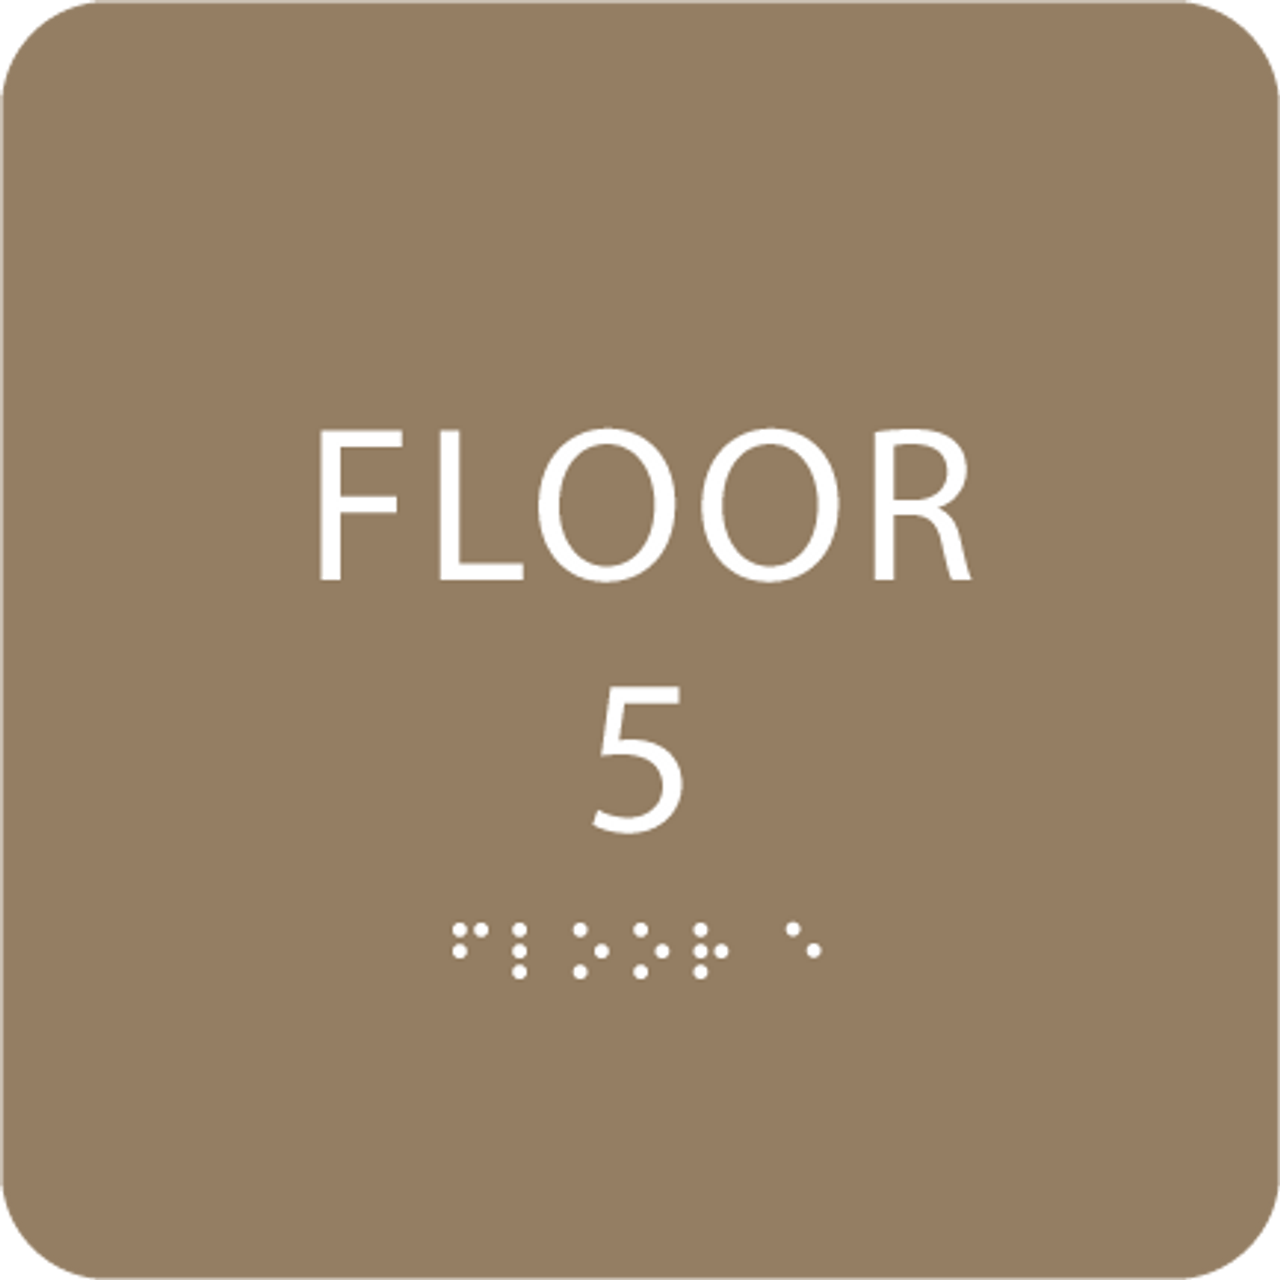 Brown Floor 5 Level Identification Sign